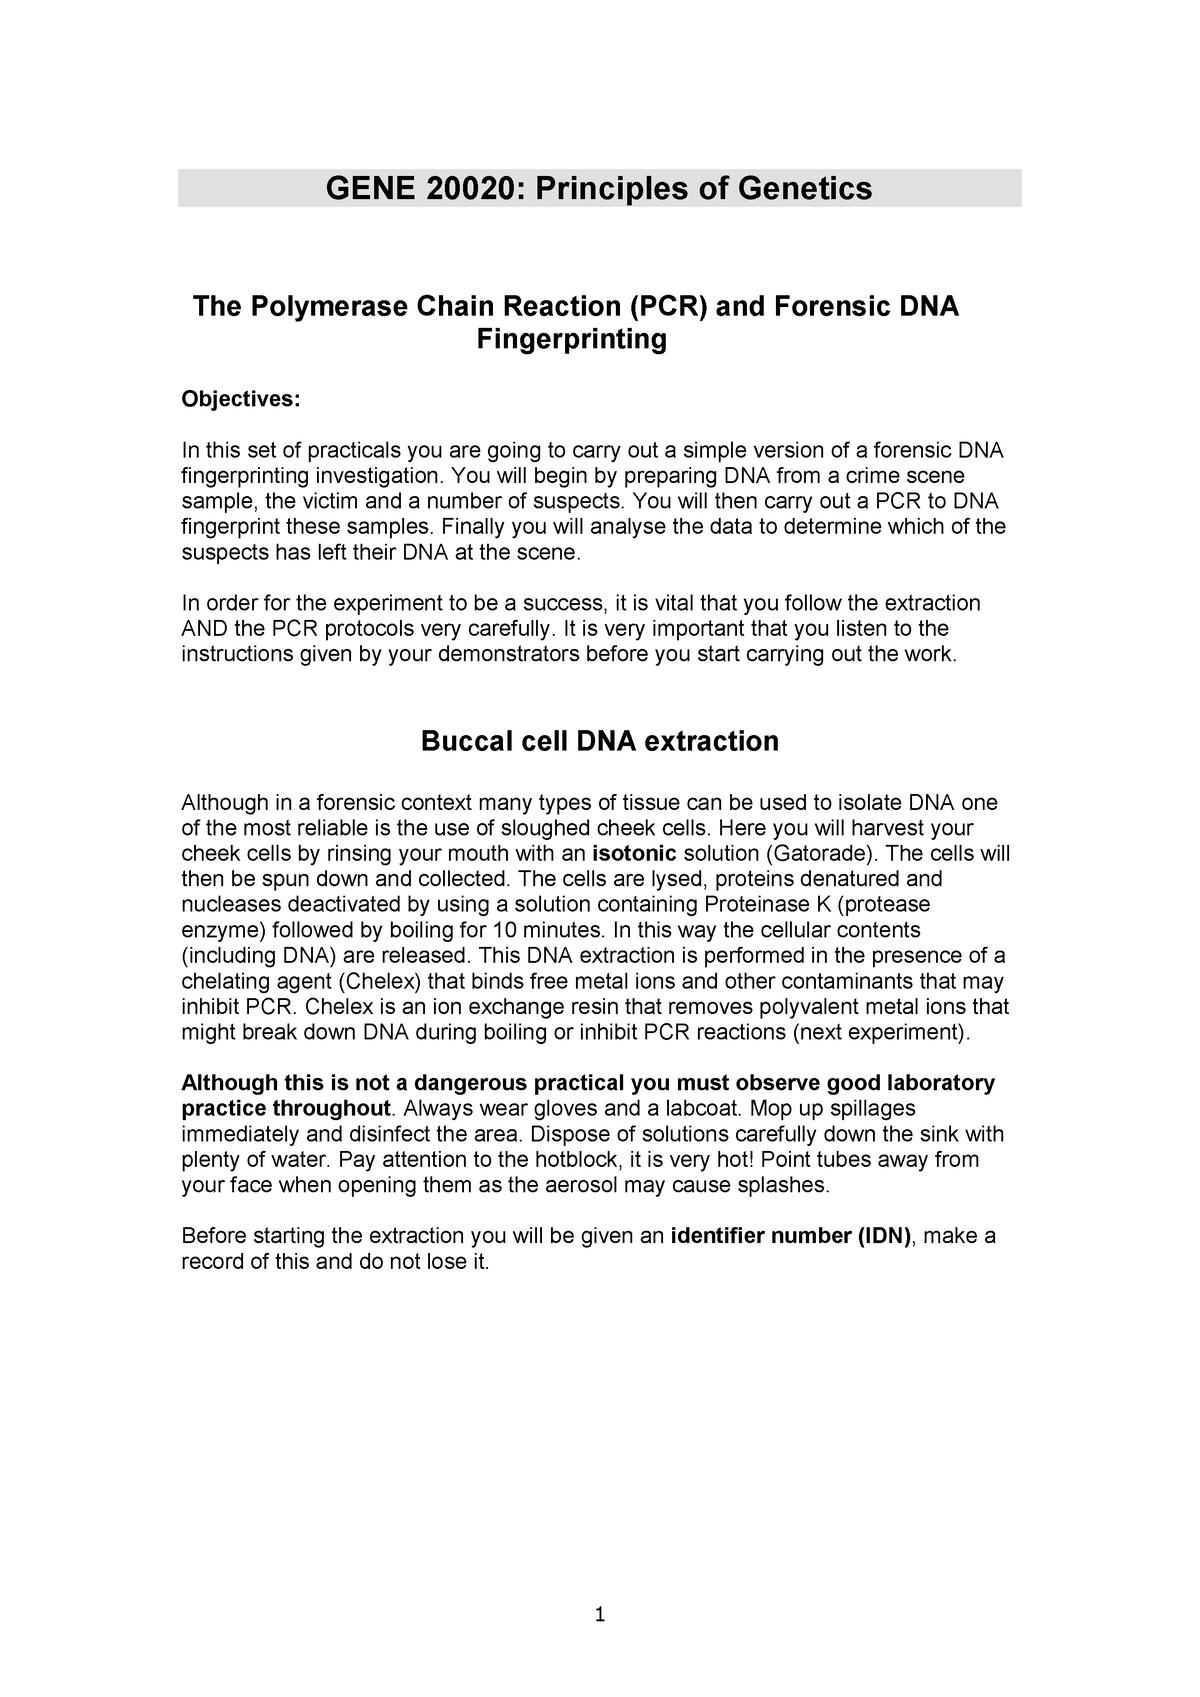 Principles of genetics lab manual: lab 1 and 2 - GENE20020